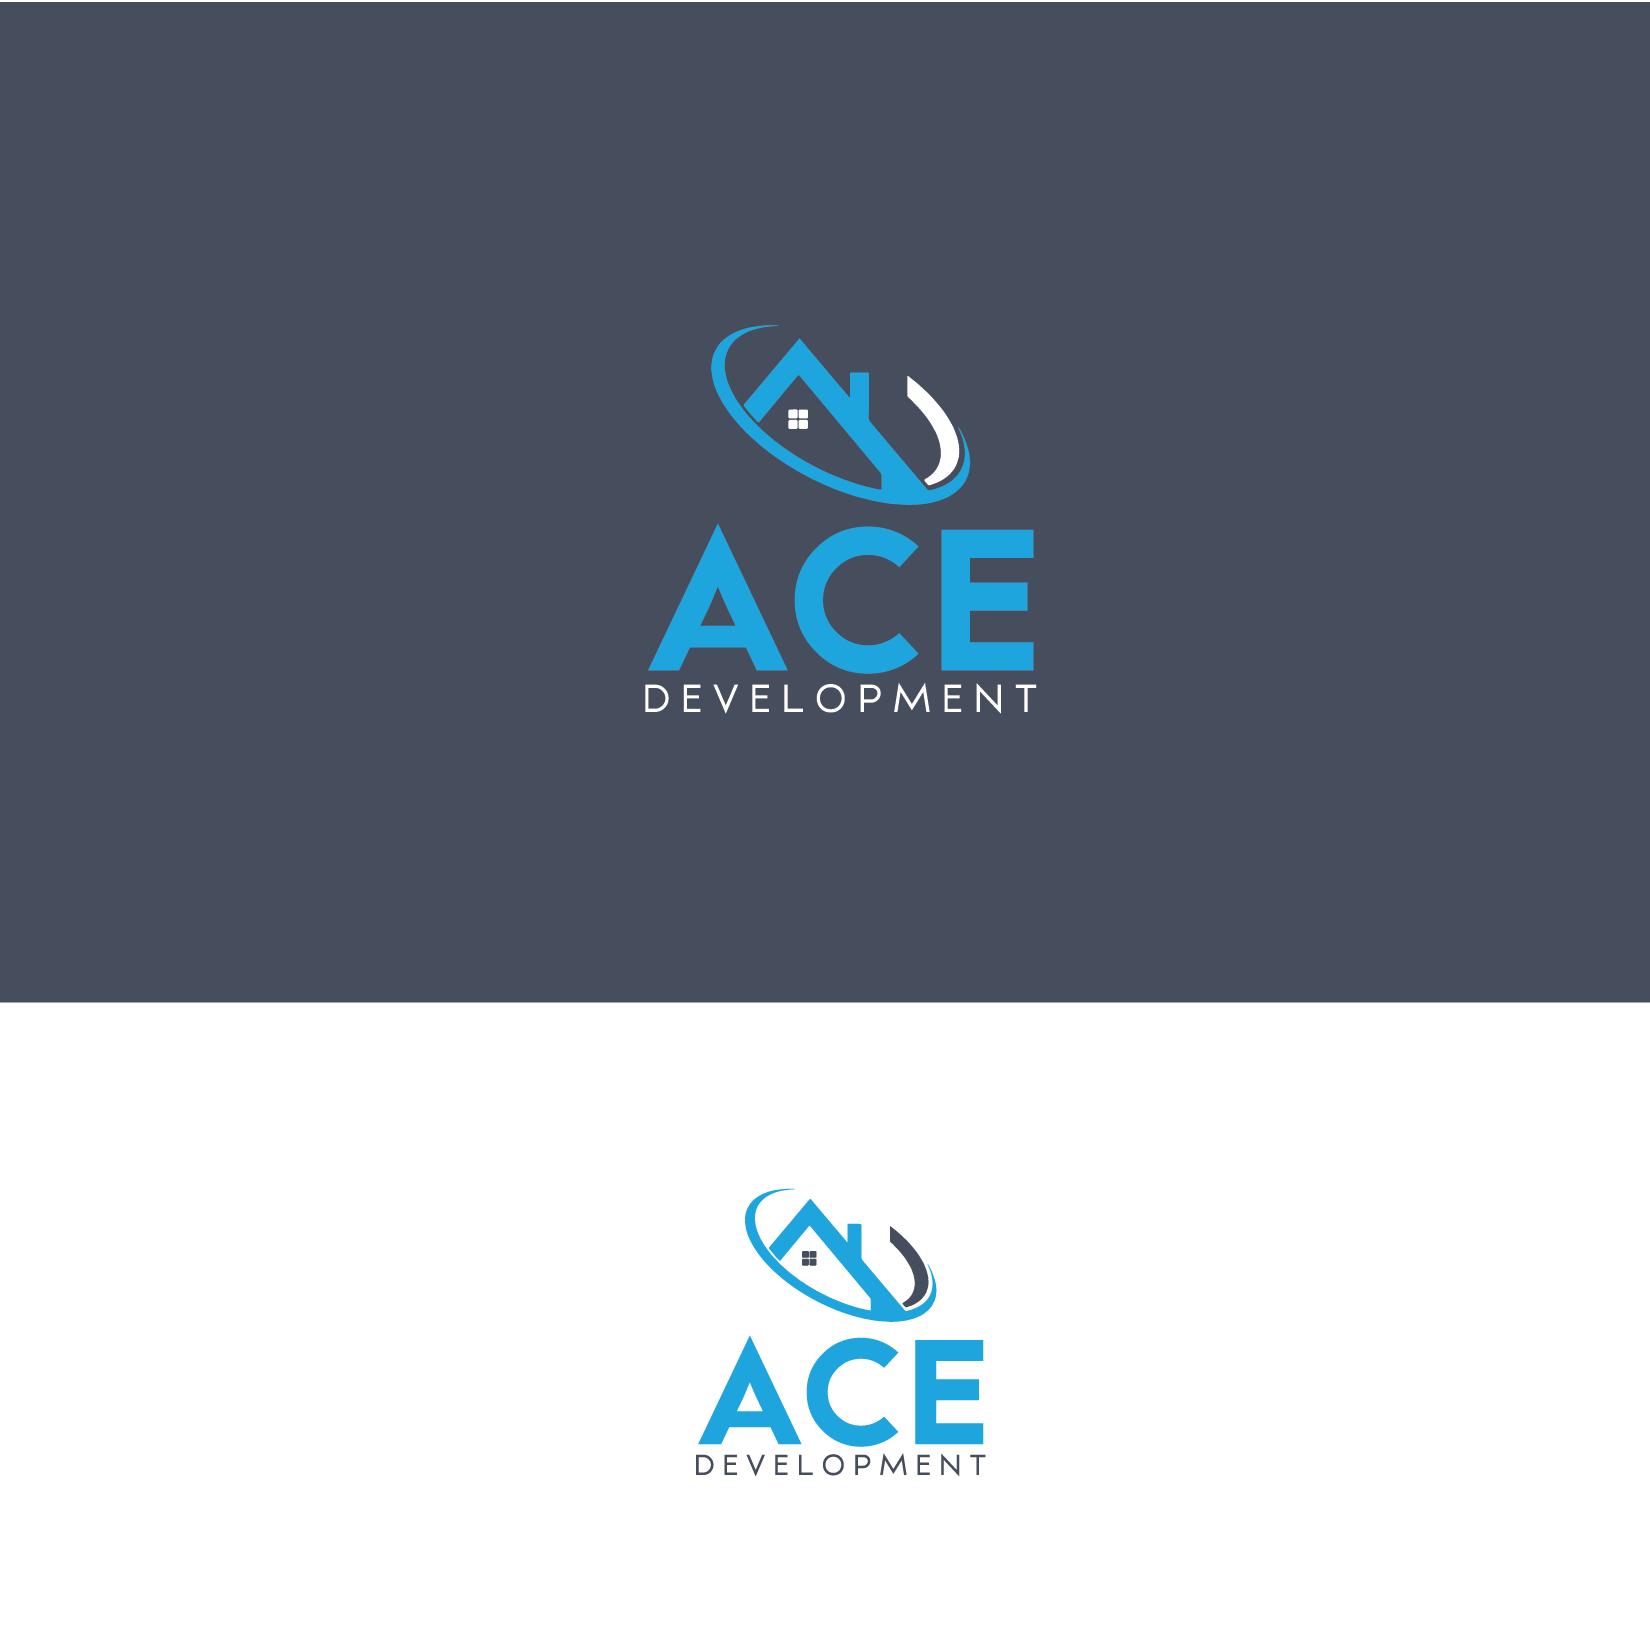 Logo Design by Private User - Entry No. 98 in the Logo Design Contest Fun Logo Design for Ace development.